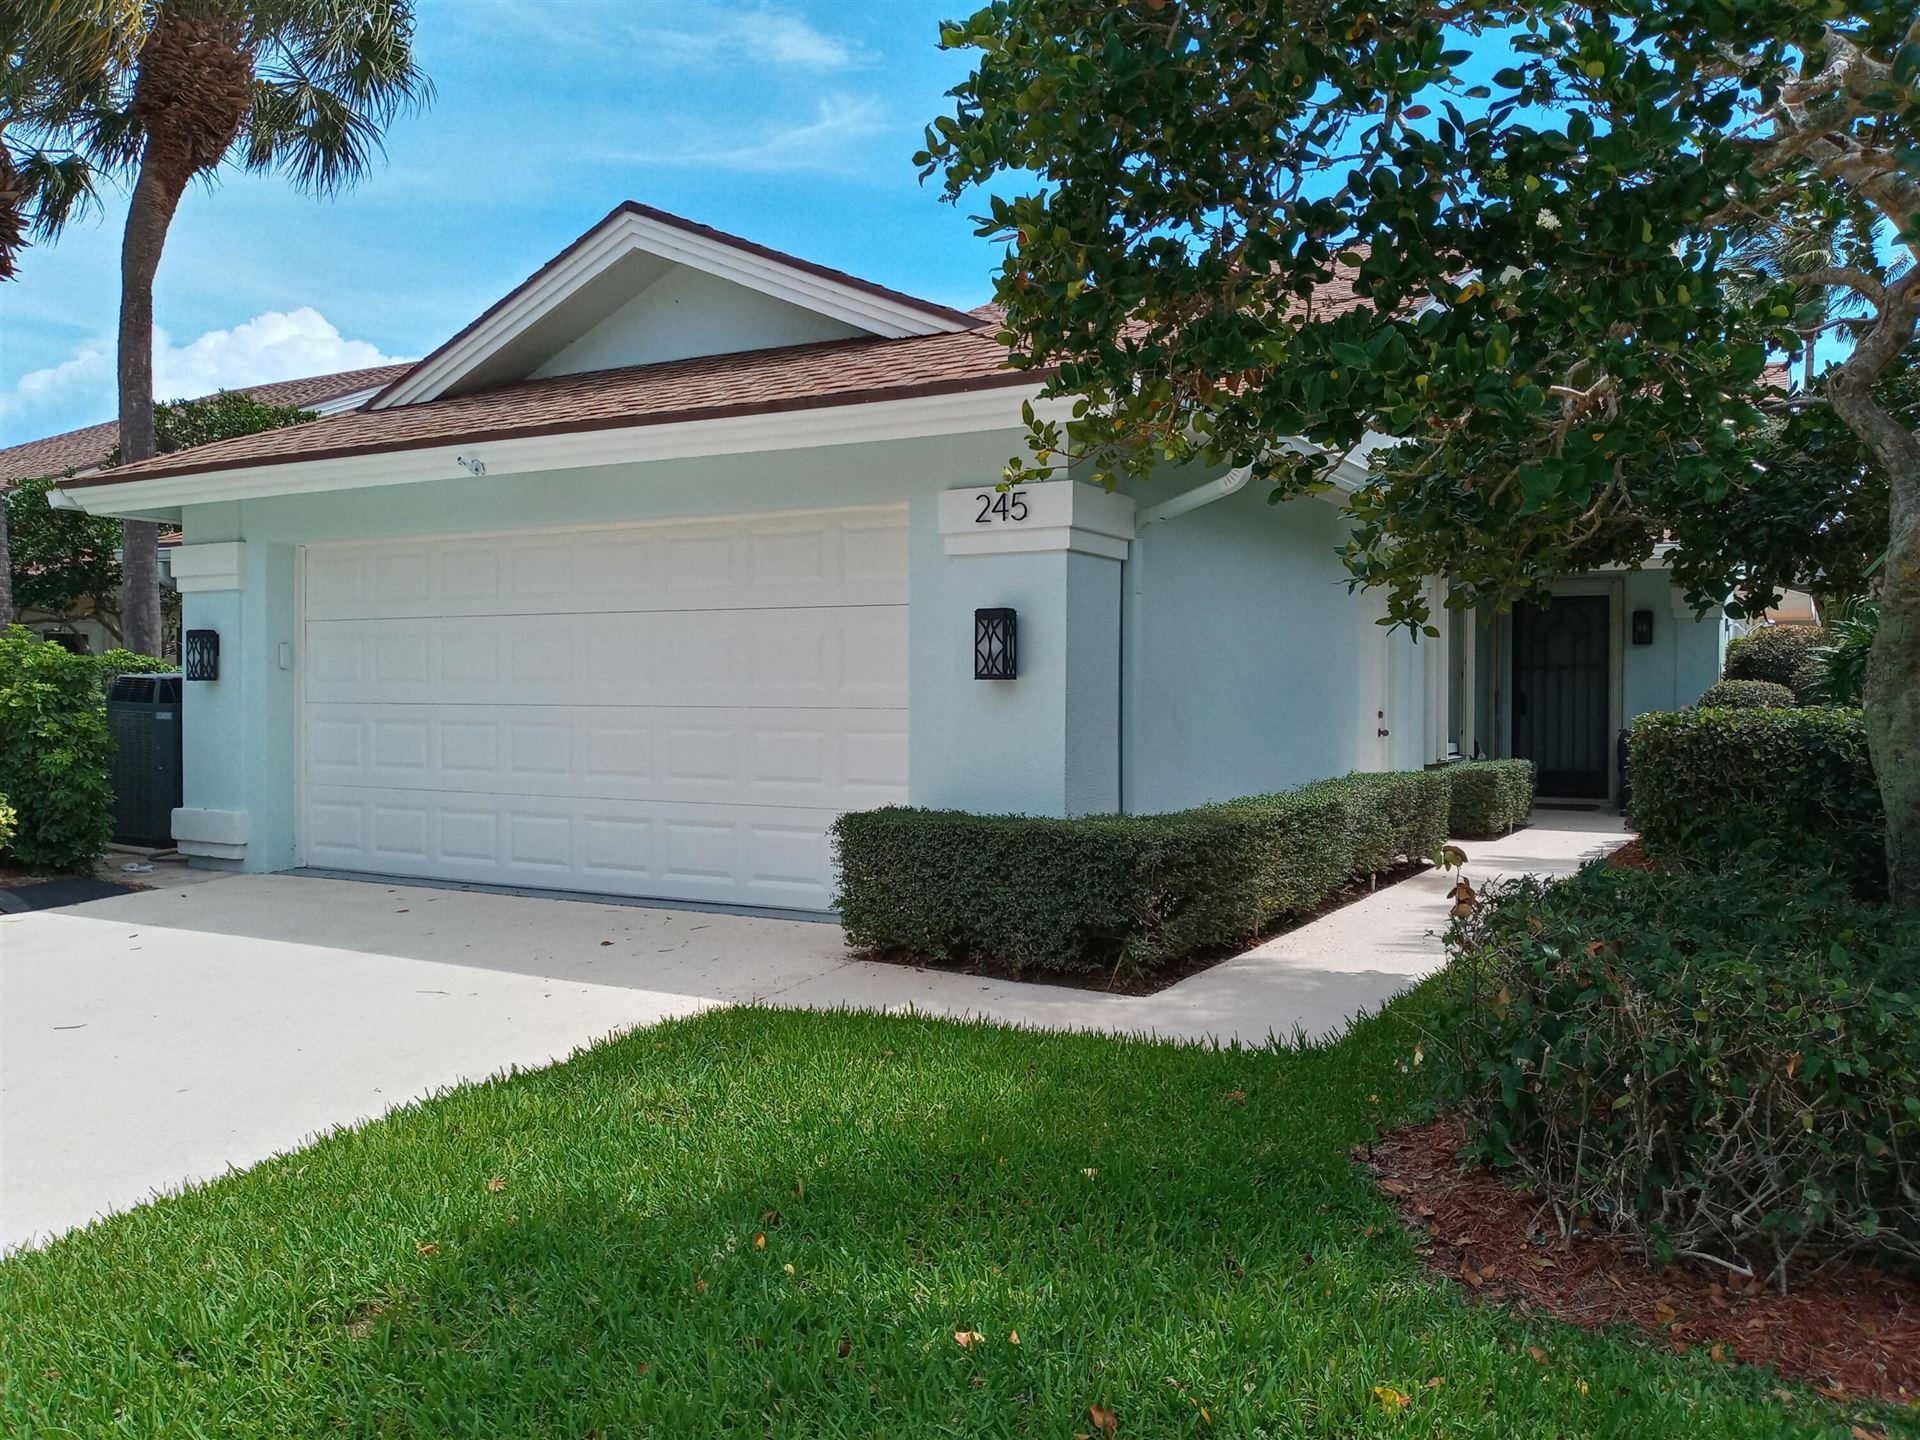 Photo of 245 River Park Drive, Jupiter, FL 33477 (MLS # RX-10704187)